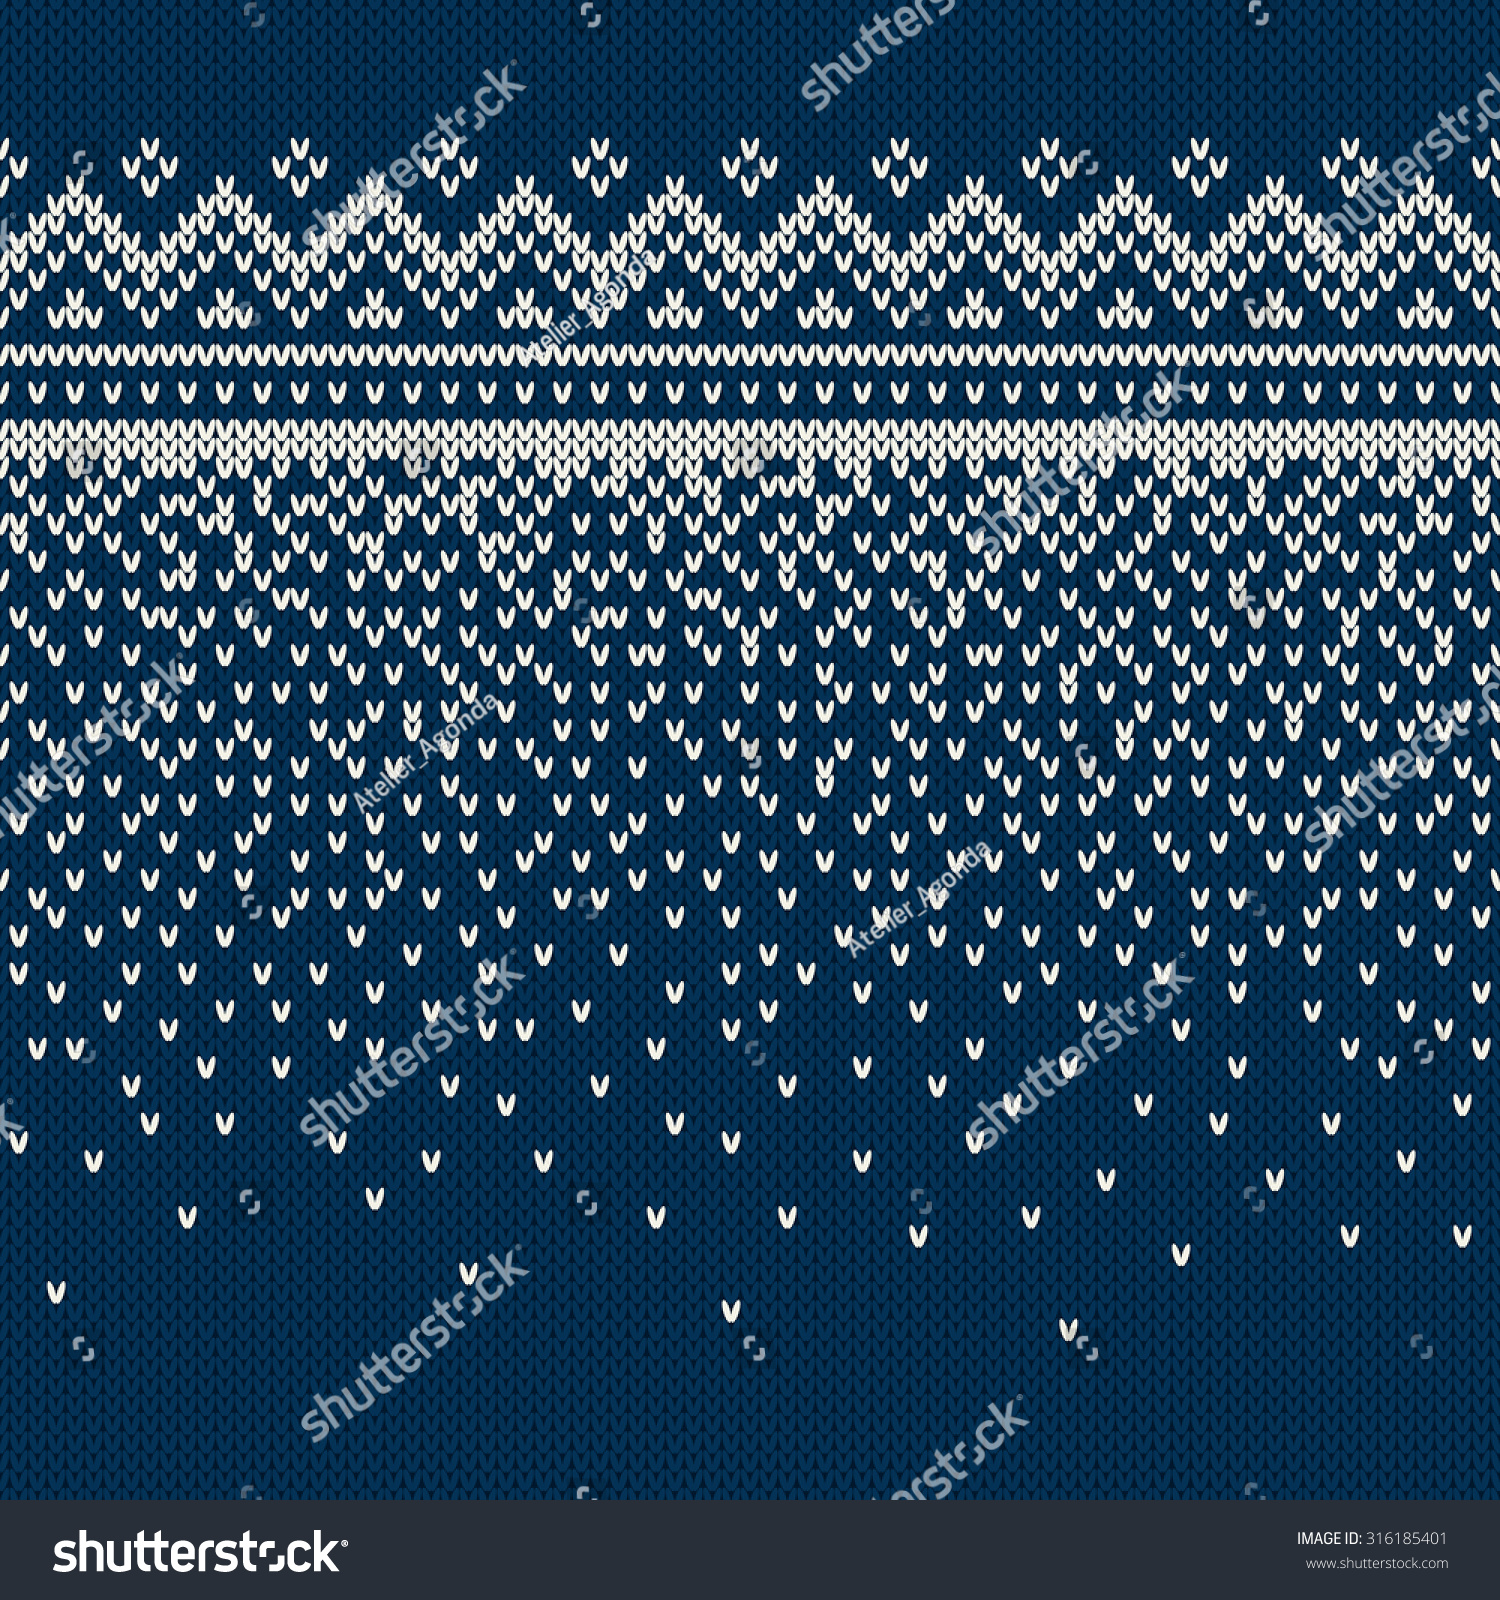 Christmas Sweater Design. Seamless Knitting Pattern Stock Vector Illustration...